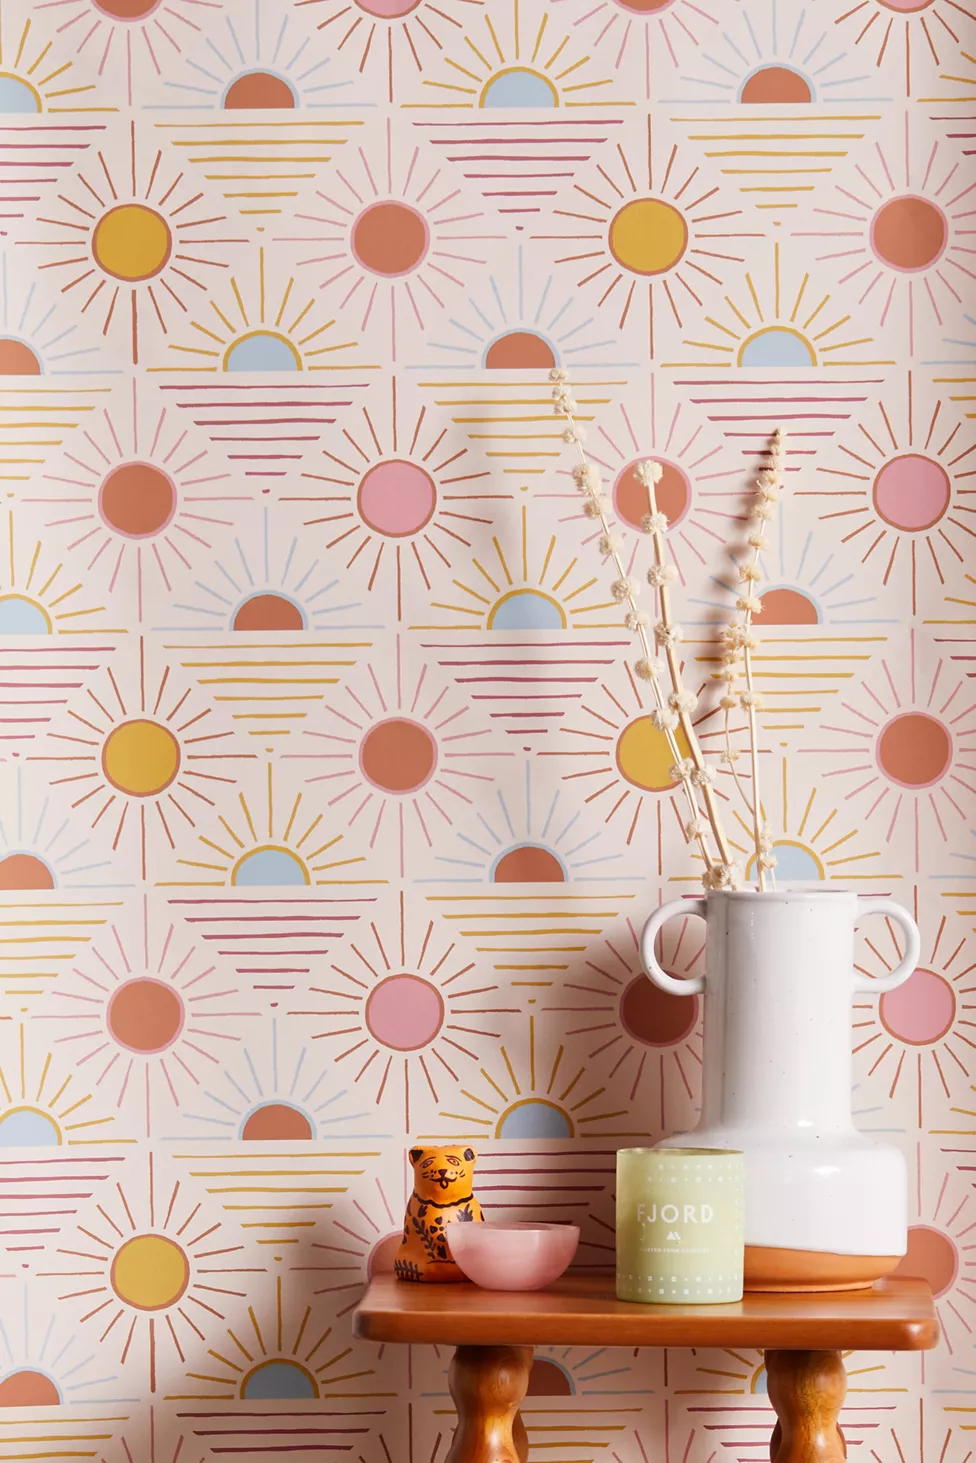 Geo Sun Removable Wallpaper Stick On Wallpaper Removable Wallpaper Shop Wallpaper